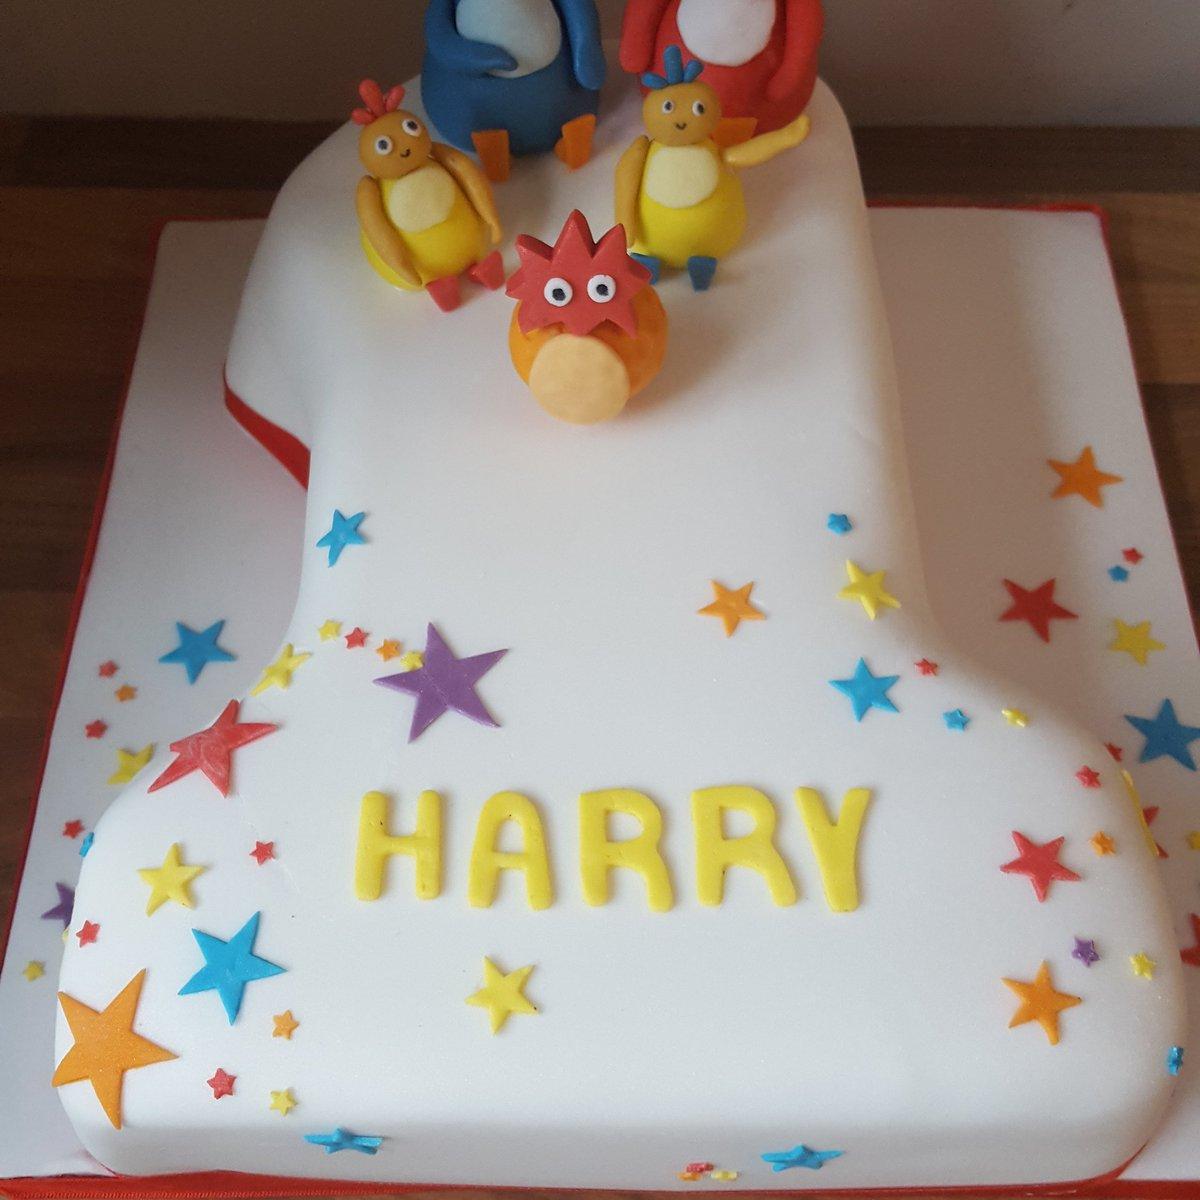 Iced Co On Twitter Twirly Woo Birthday Cake Twirlywoo Cake